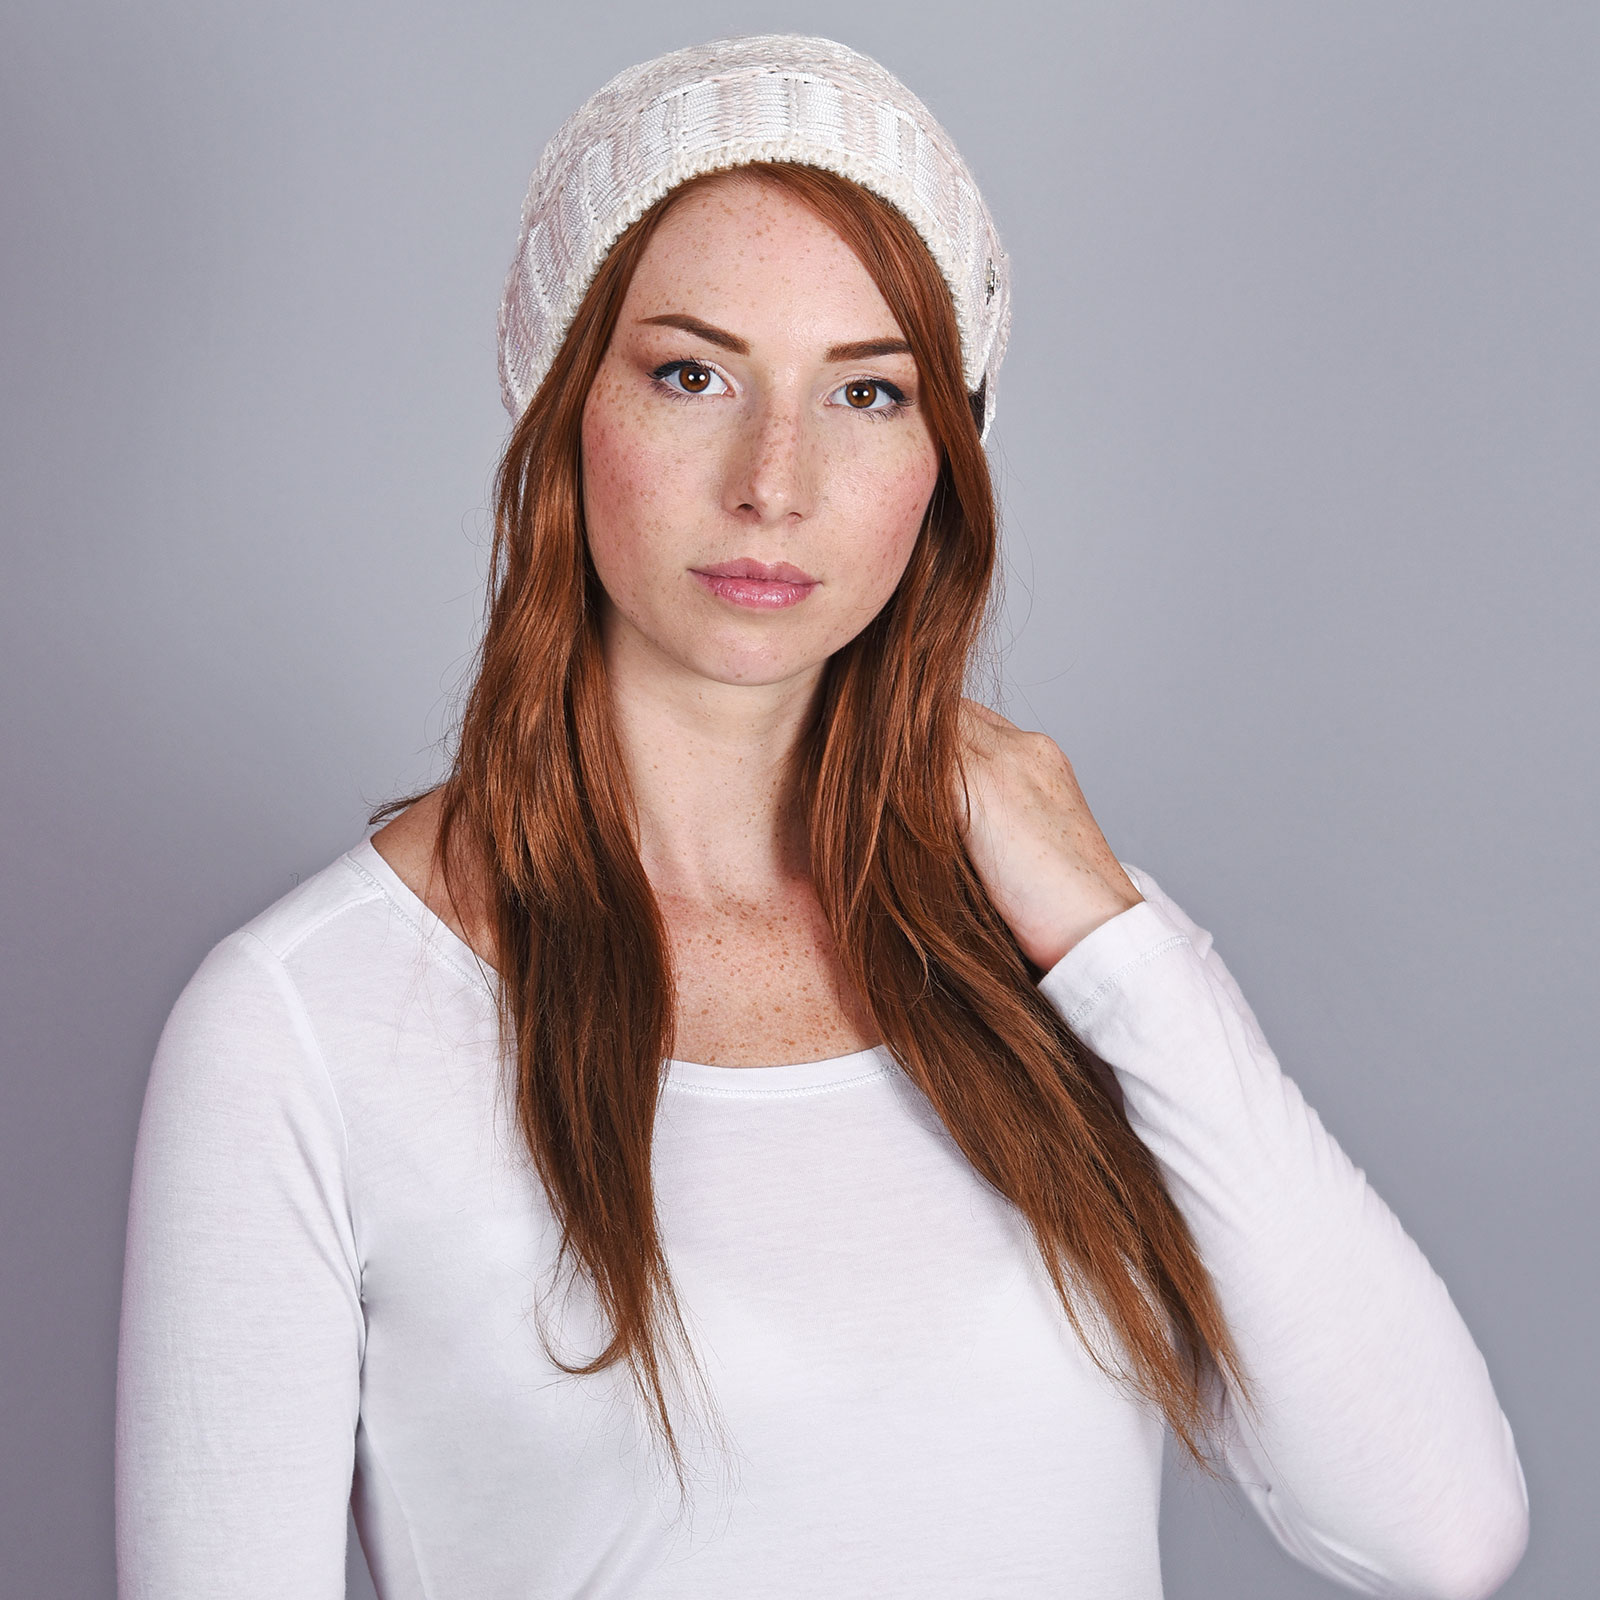 CP-01037-VF16-2-bonnet-femme-tendance-creme